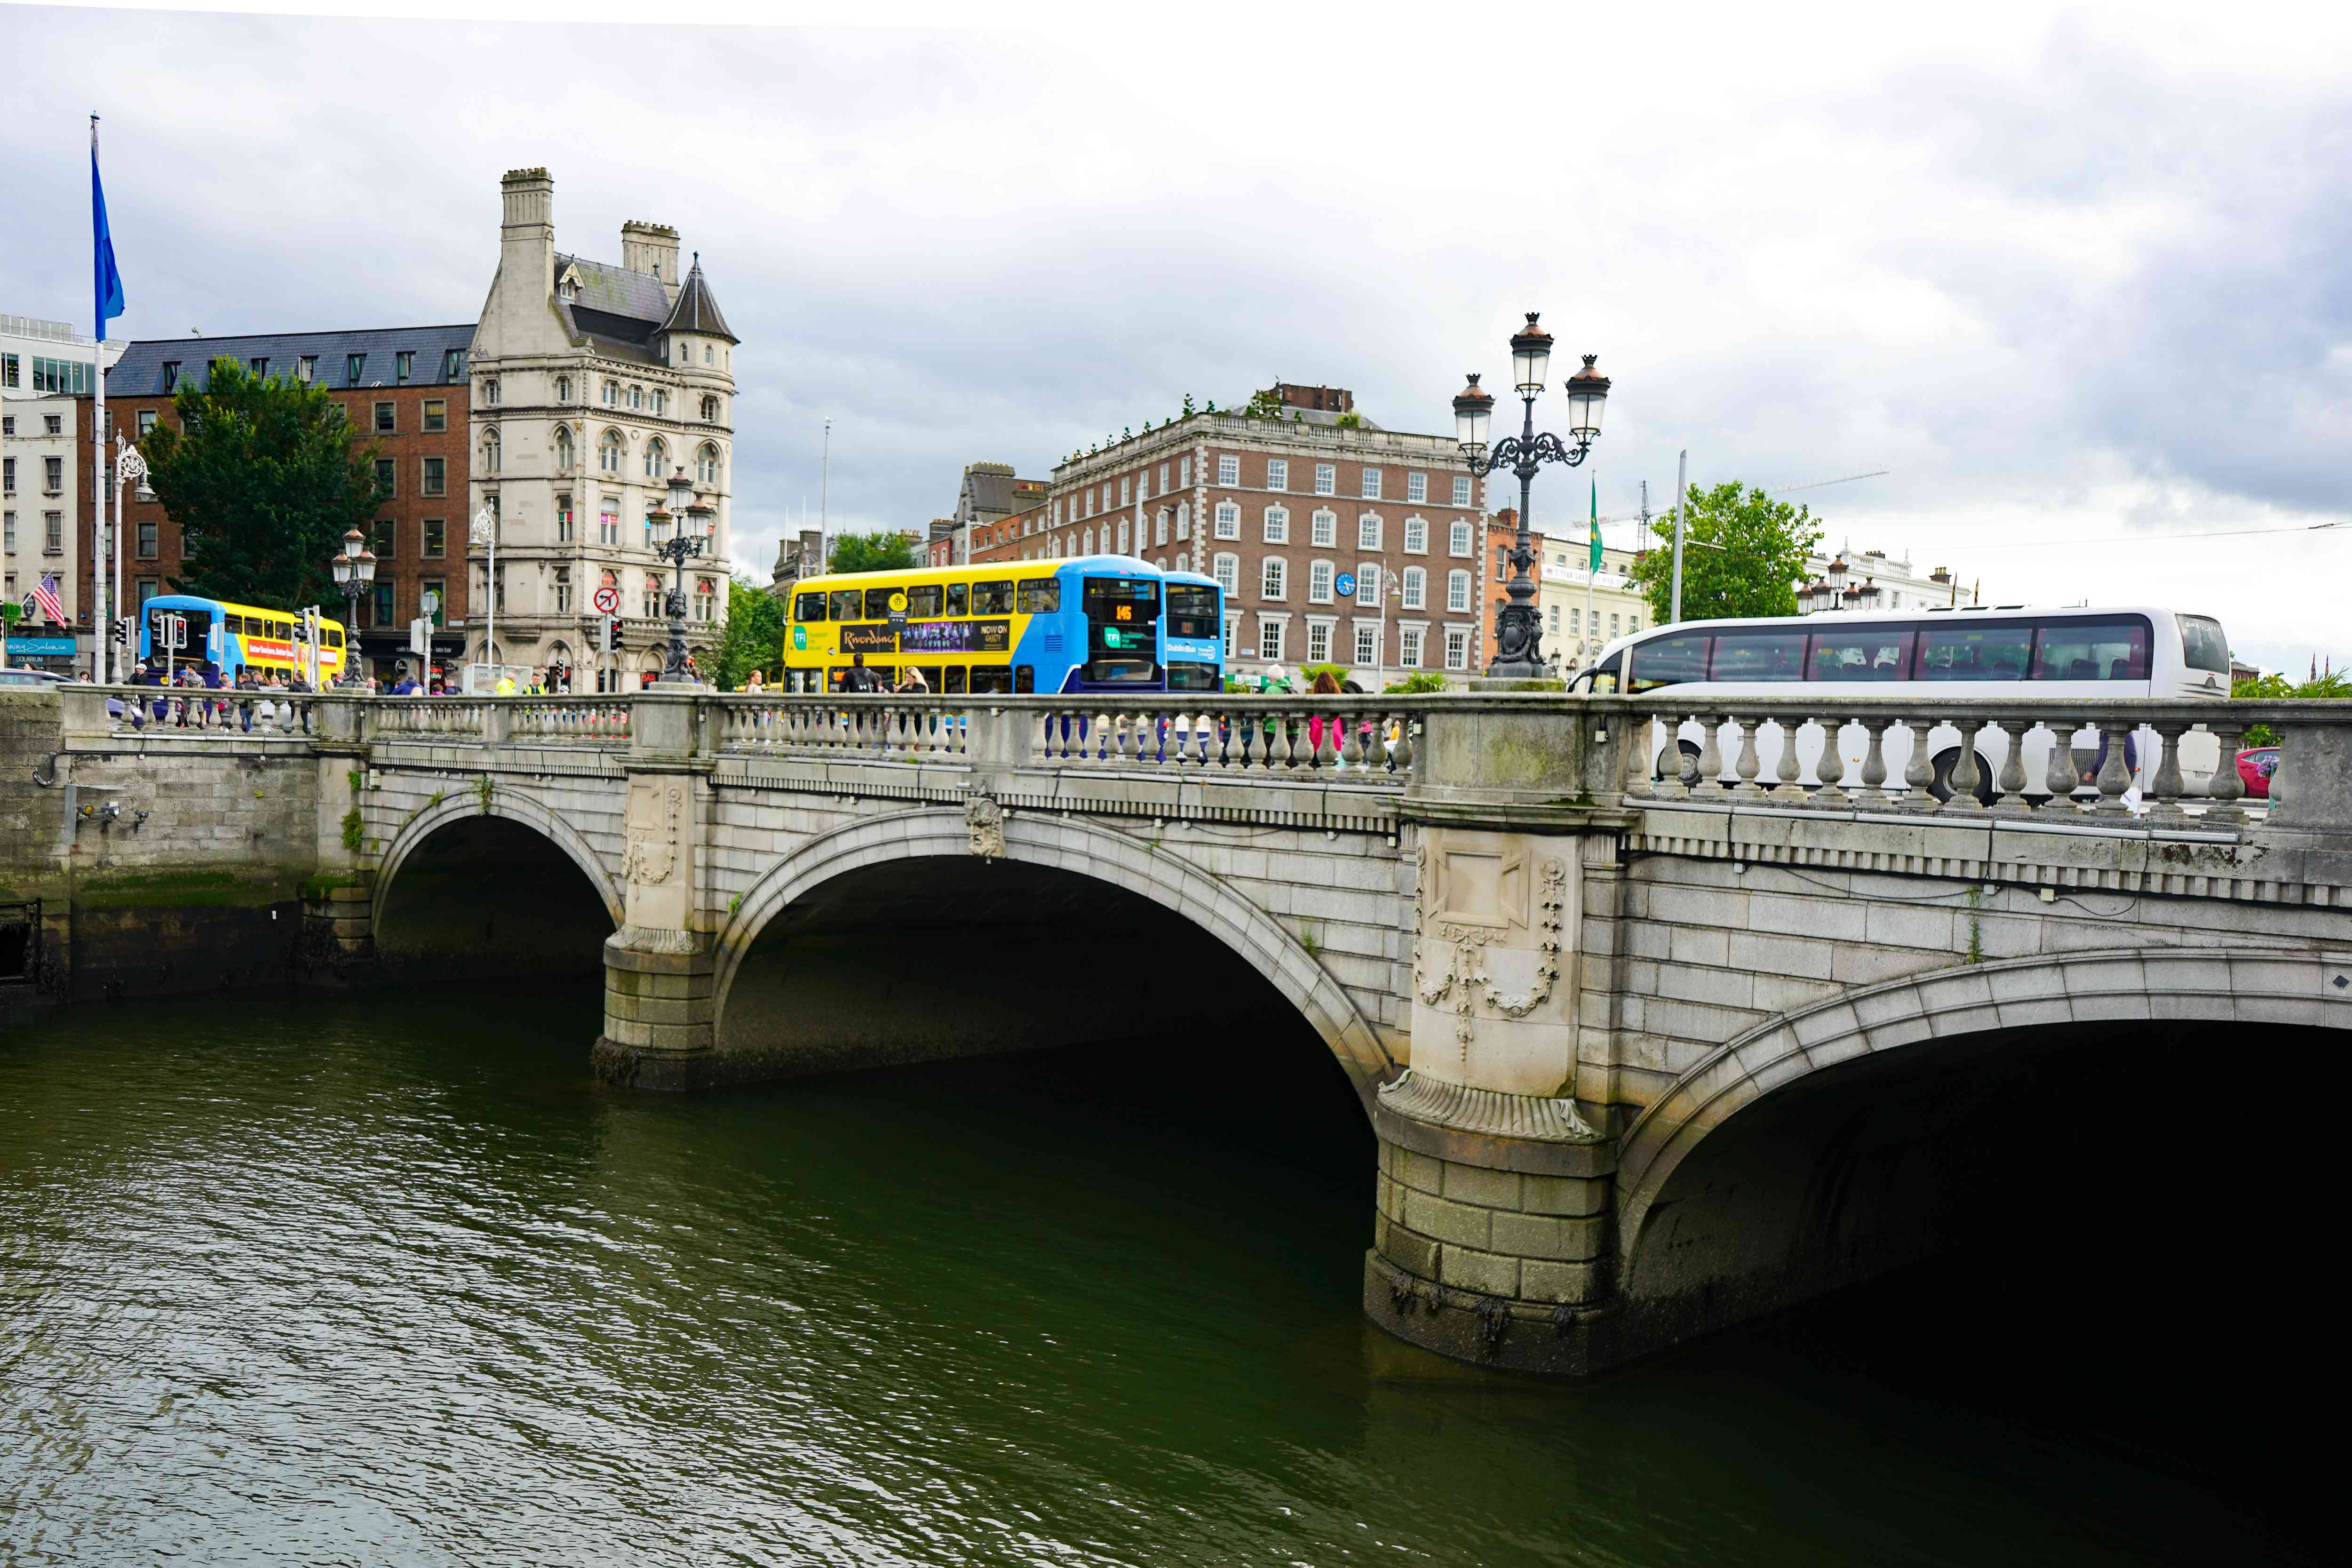 Puente O'Connell en Dublín, Irlanda